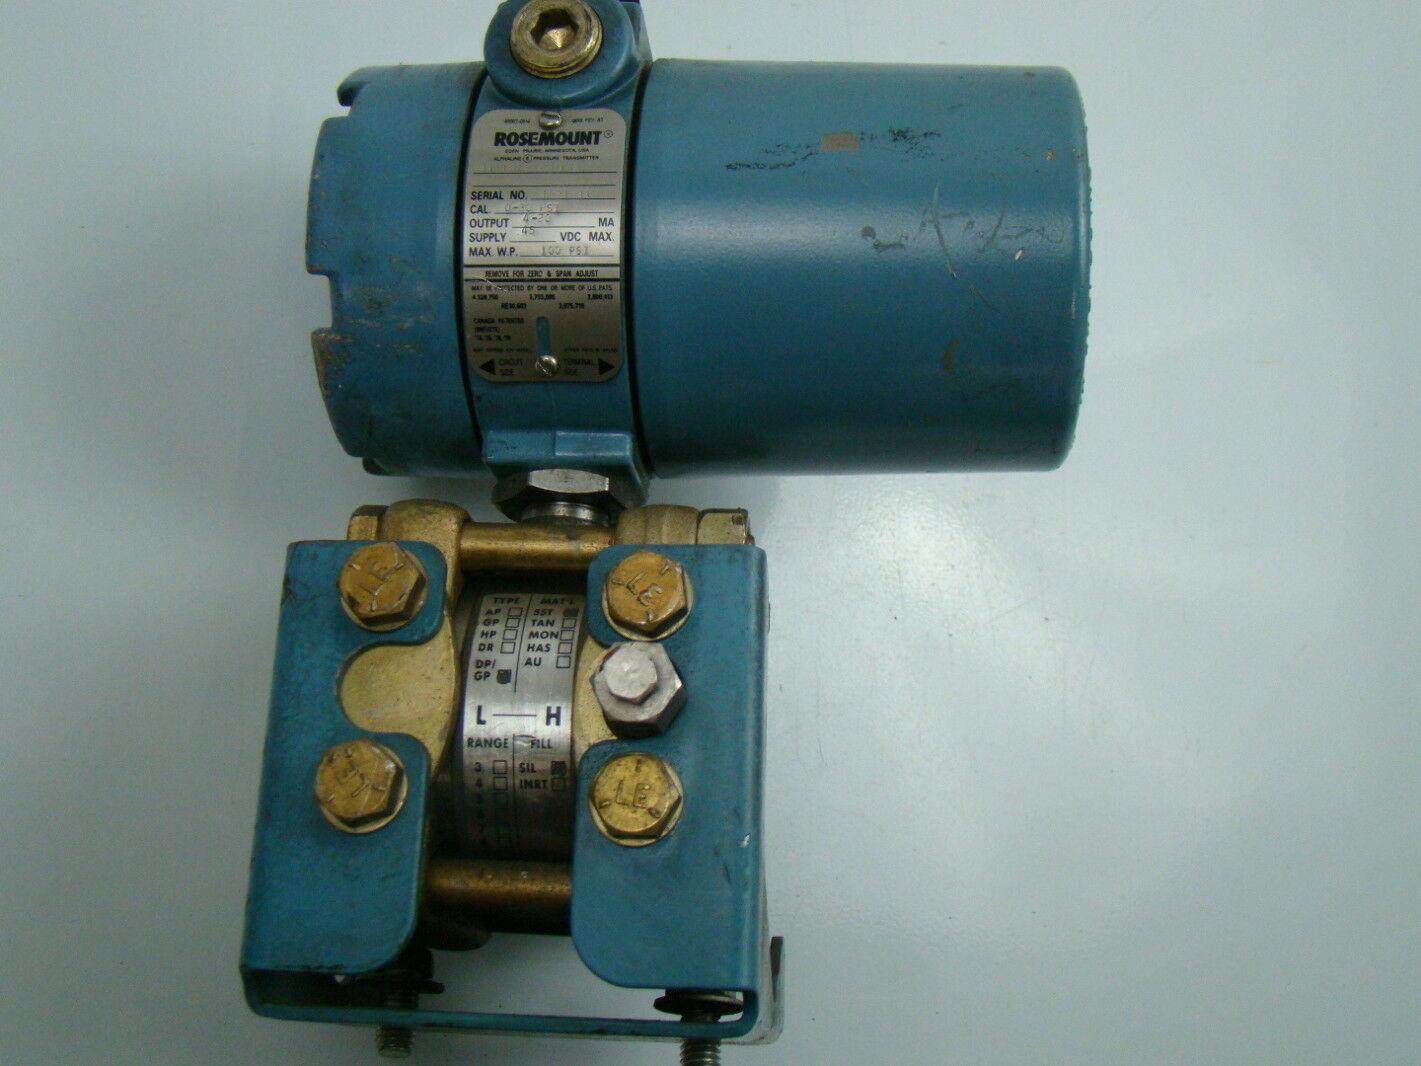 rosemount pressure transmitter wiring diagram microsoft visio workflow example 45vdc 100psi alphaline